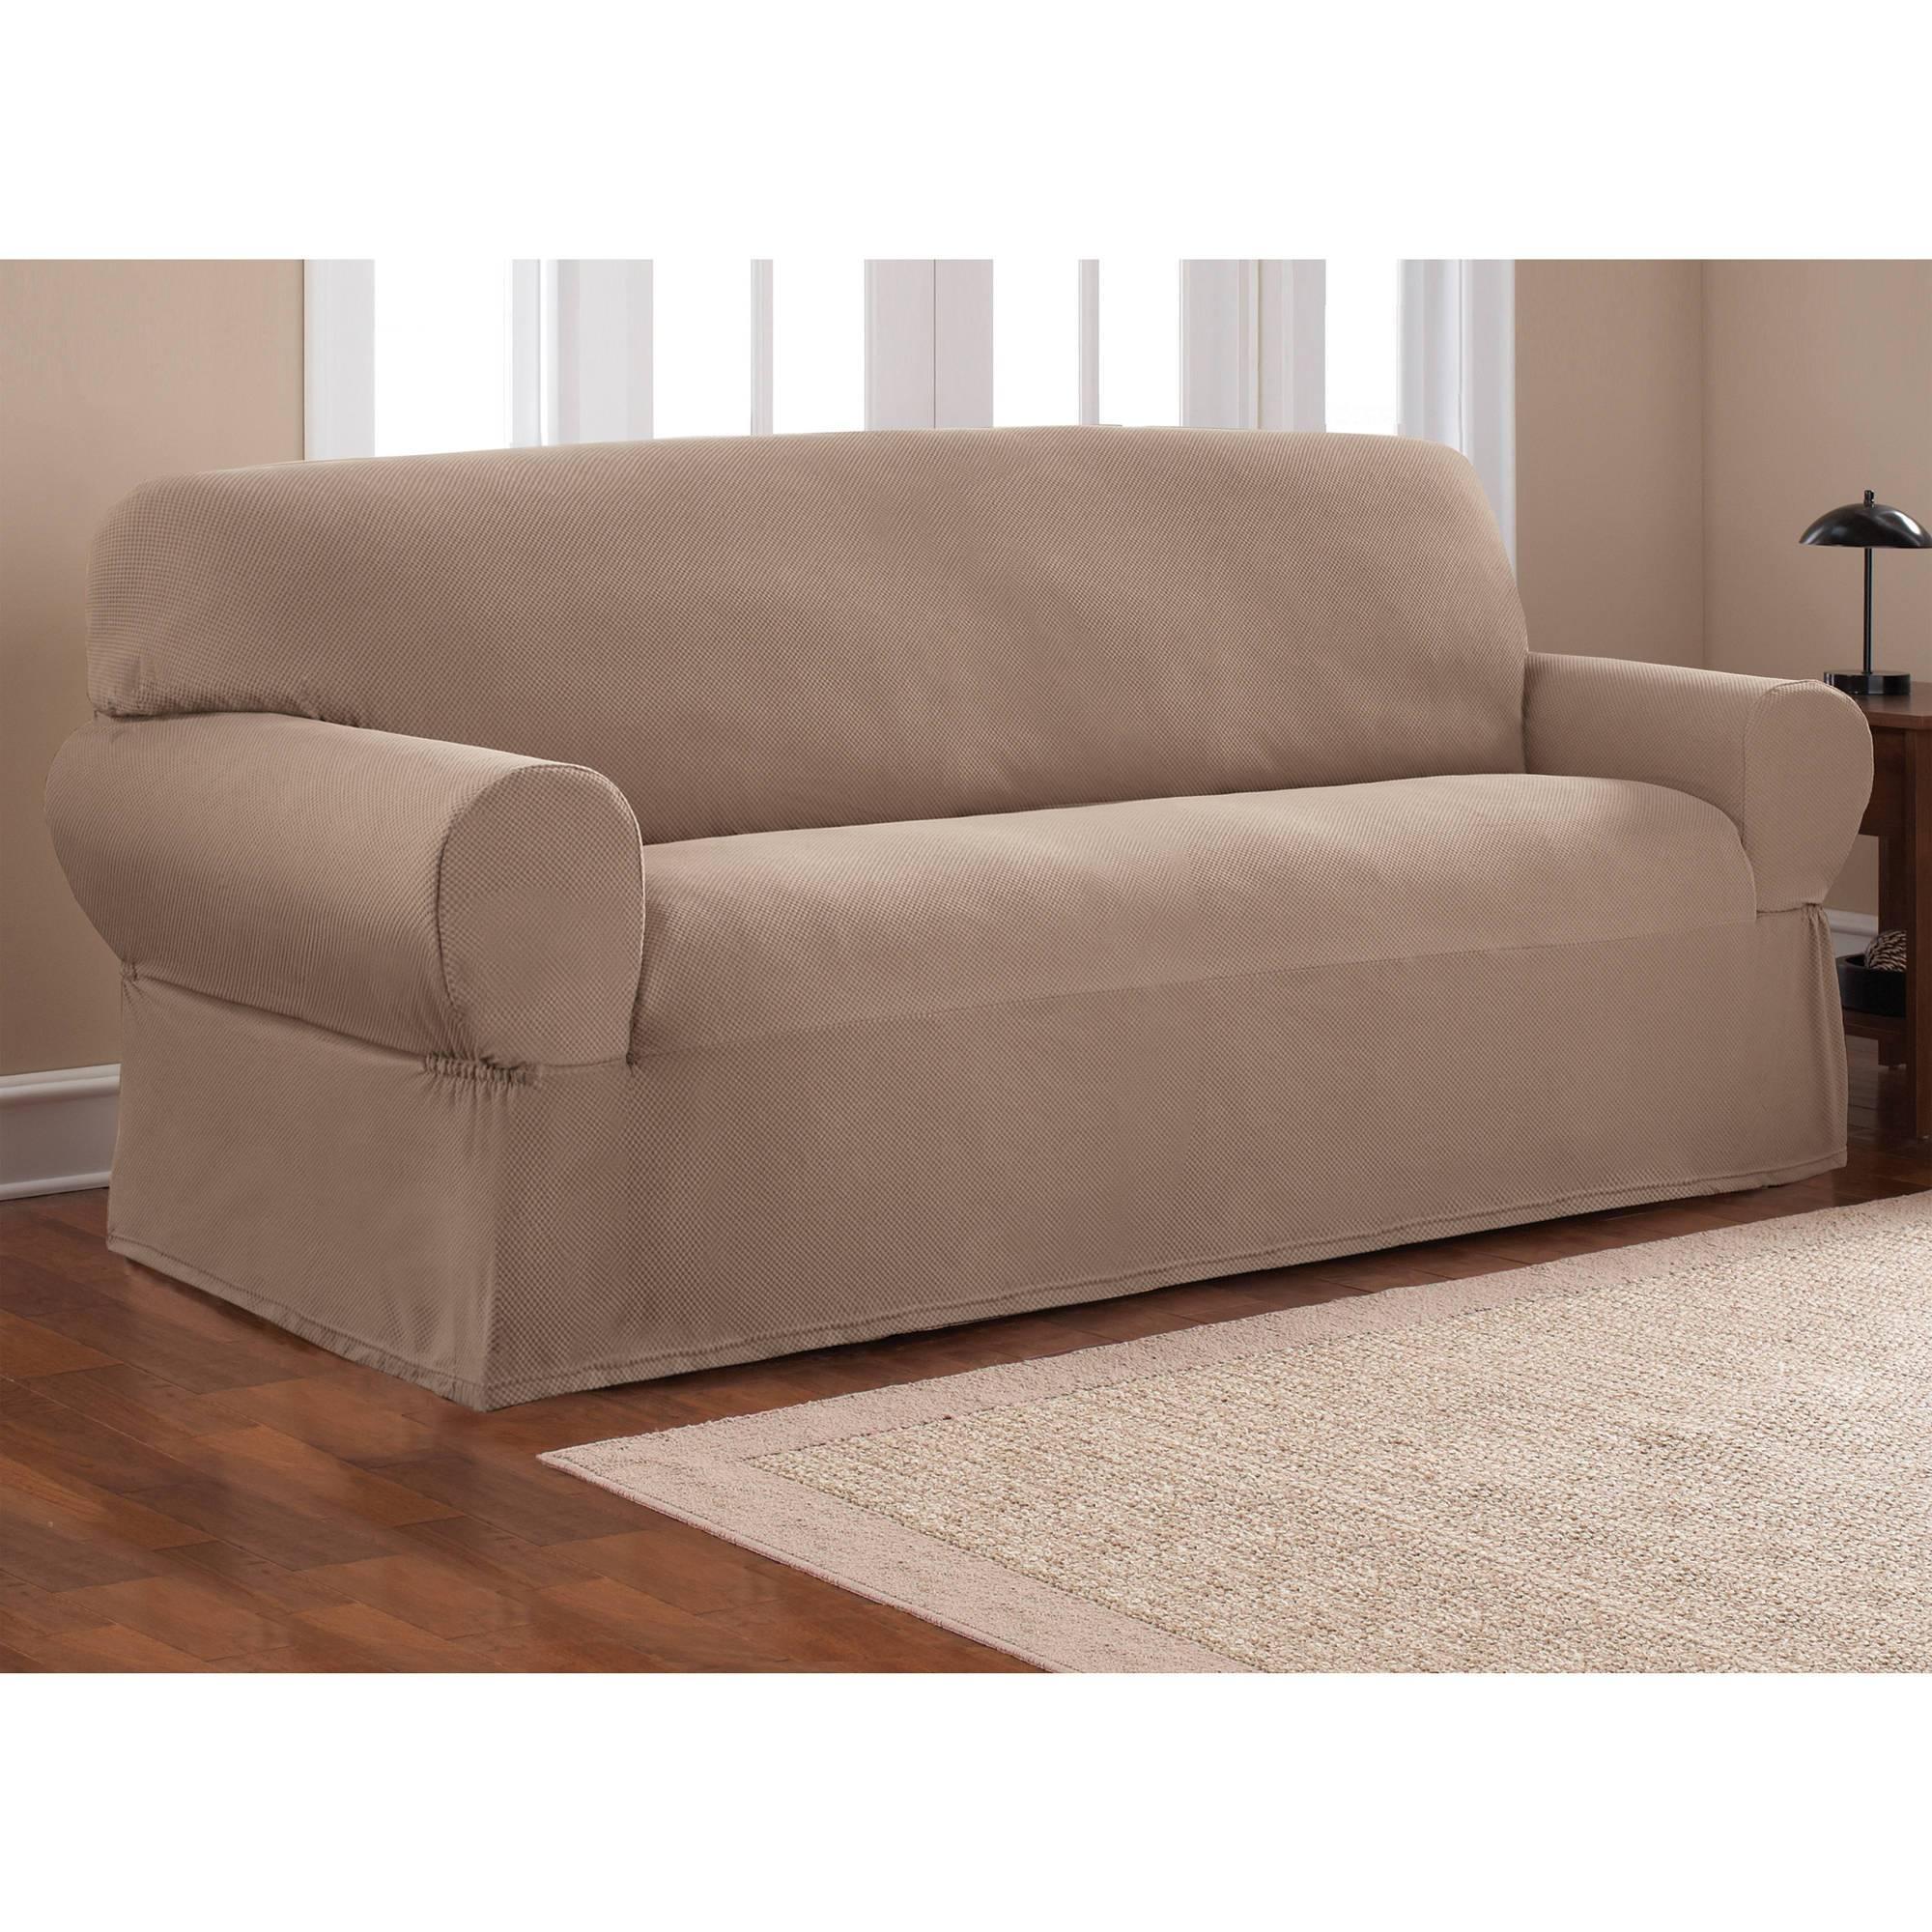 Sectional Sofa Covers Walmart - Tourdecarroll inside Sleeper Sofa Slipcovers (Image 10 of 15)